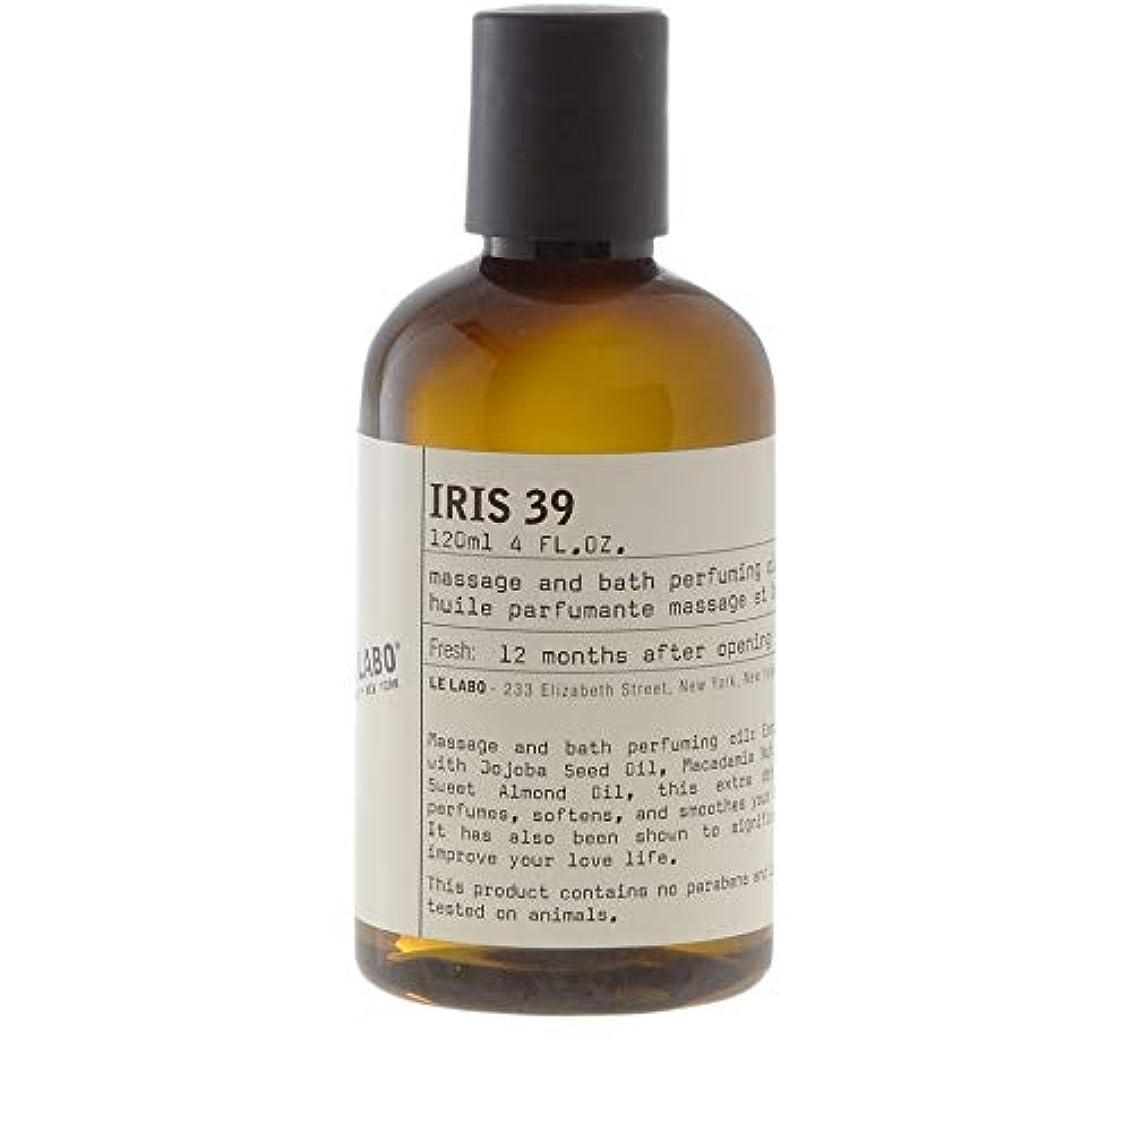 [Le Labo ] ルラボアイリス39ボディオイル118ミリリットル - Le Labo Iris 39 Body Oil 118ml [並行輸入品]